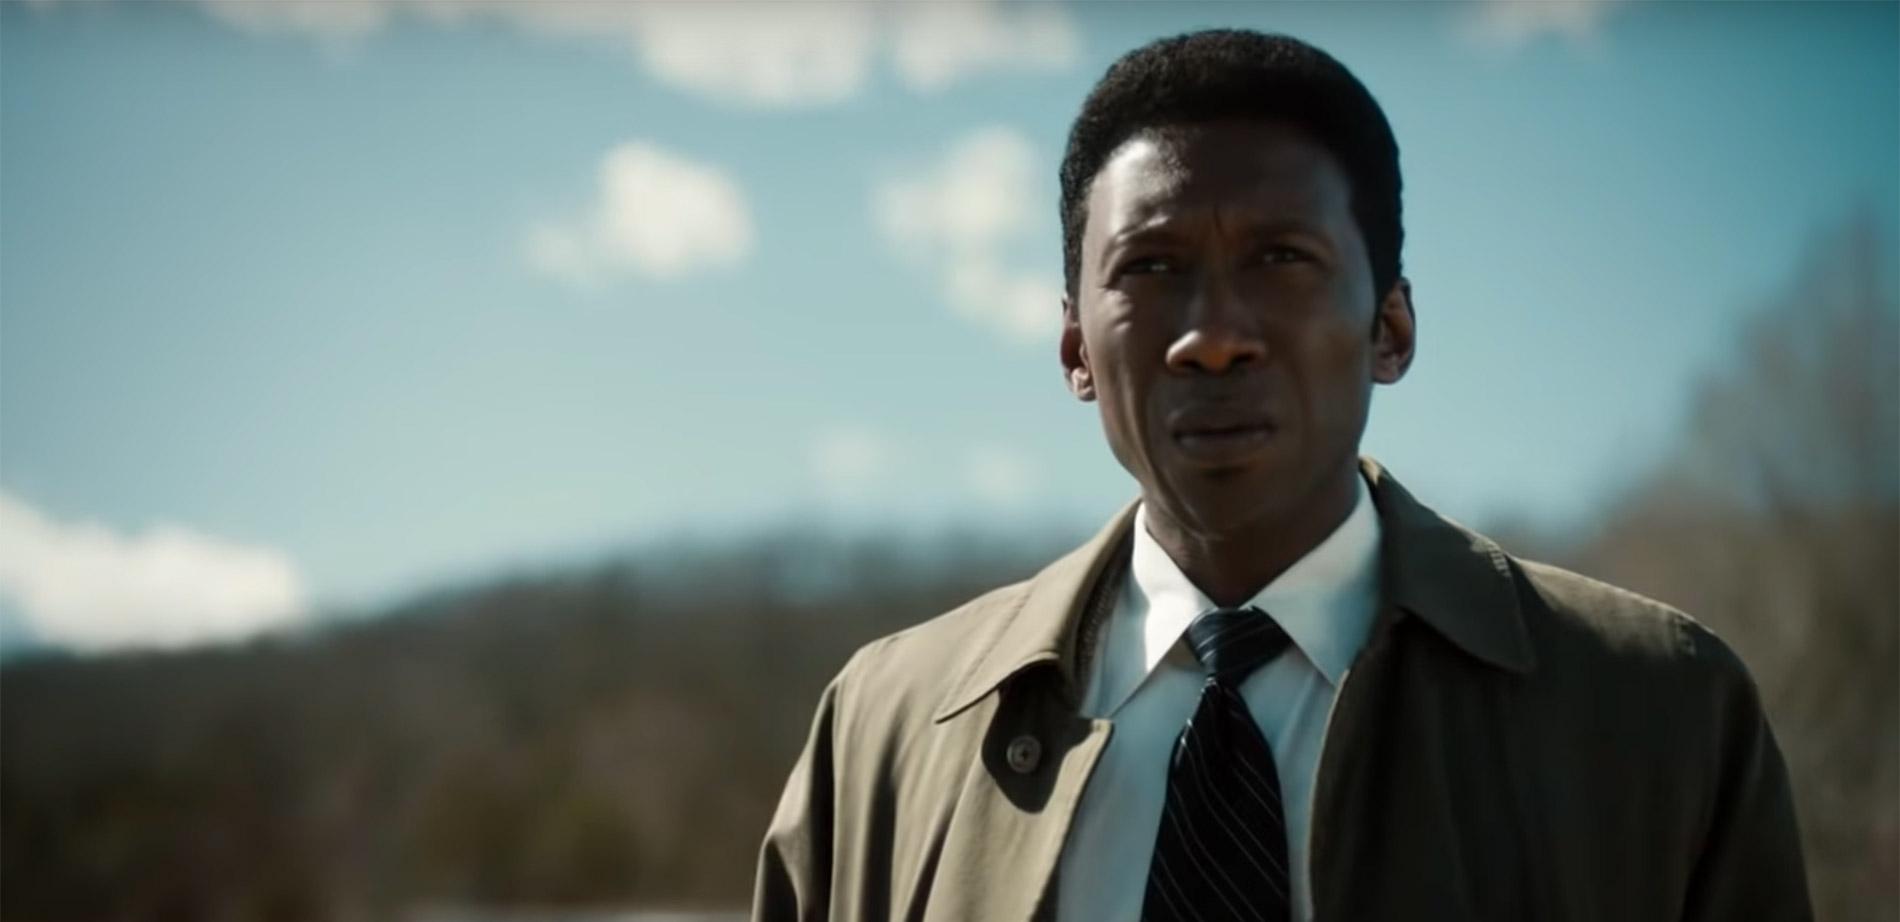 True-Detective-Season-3-Featured.jpg